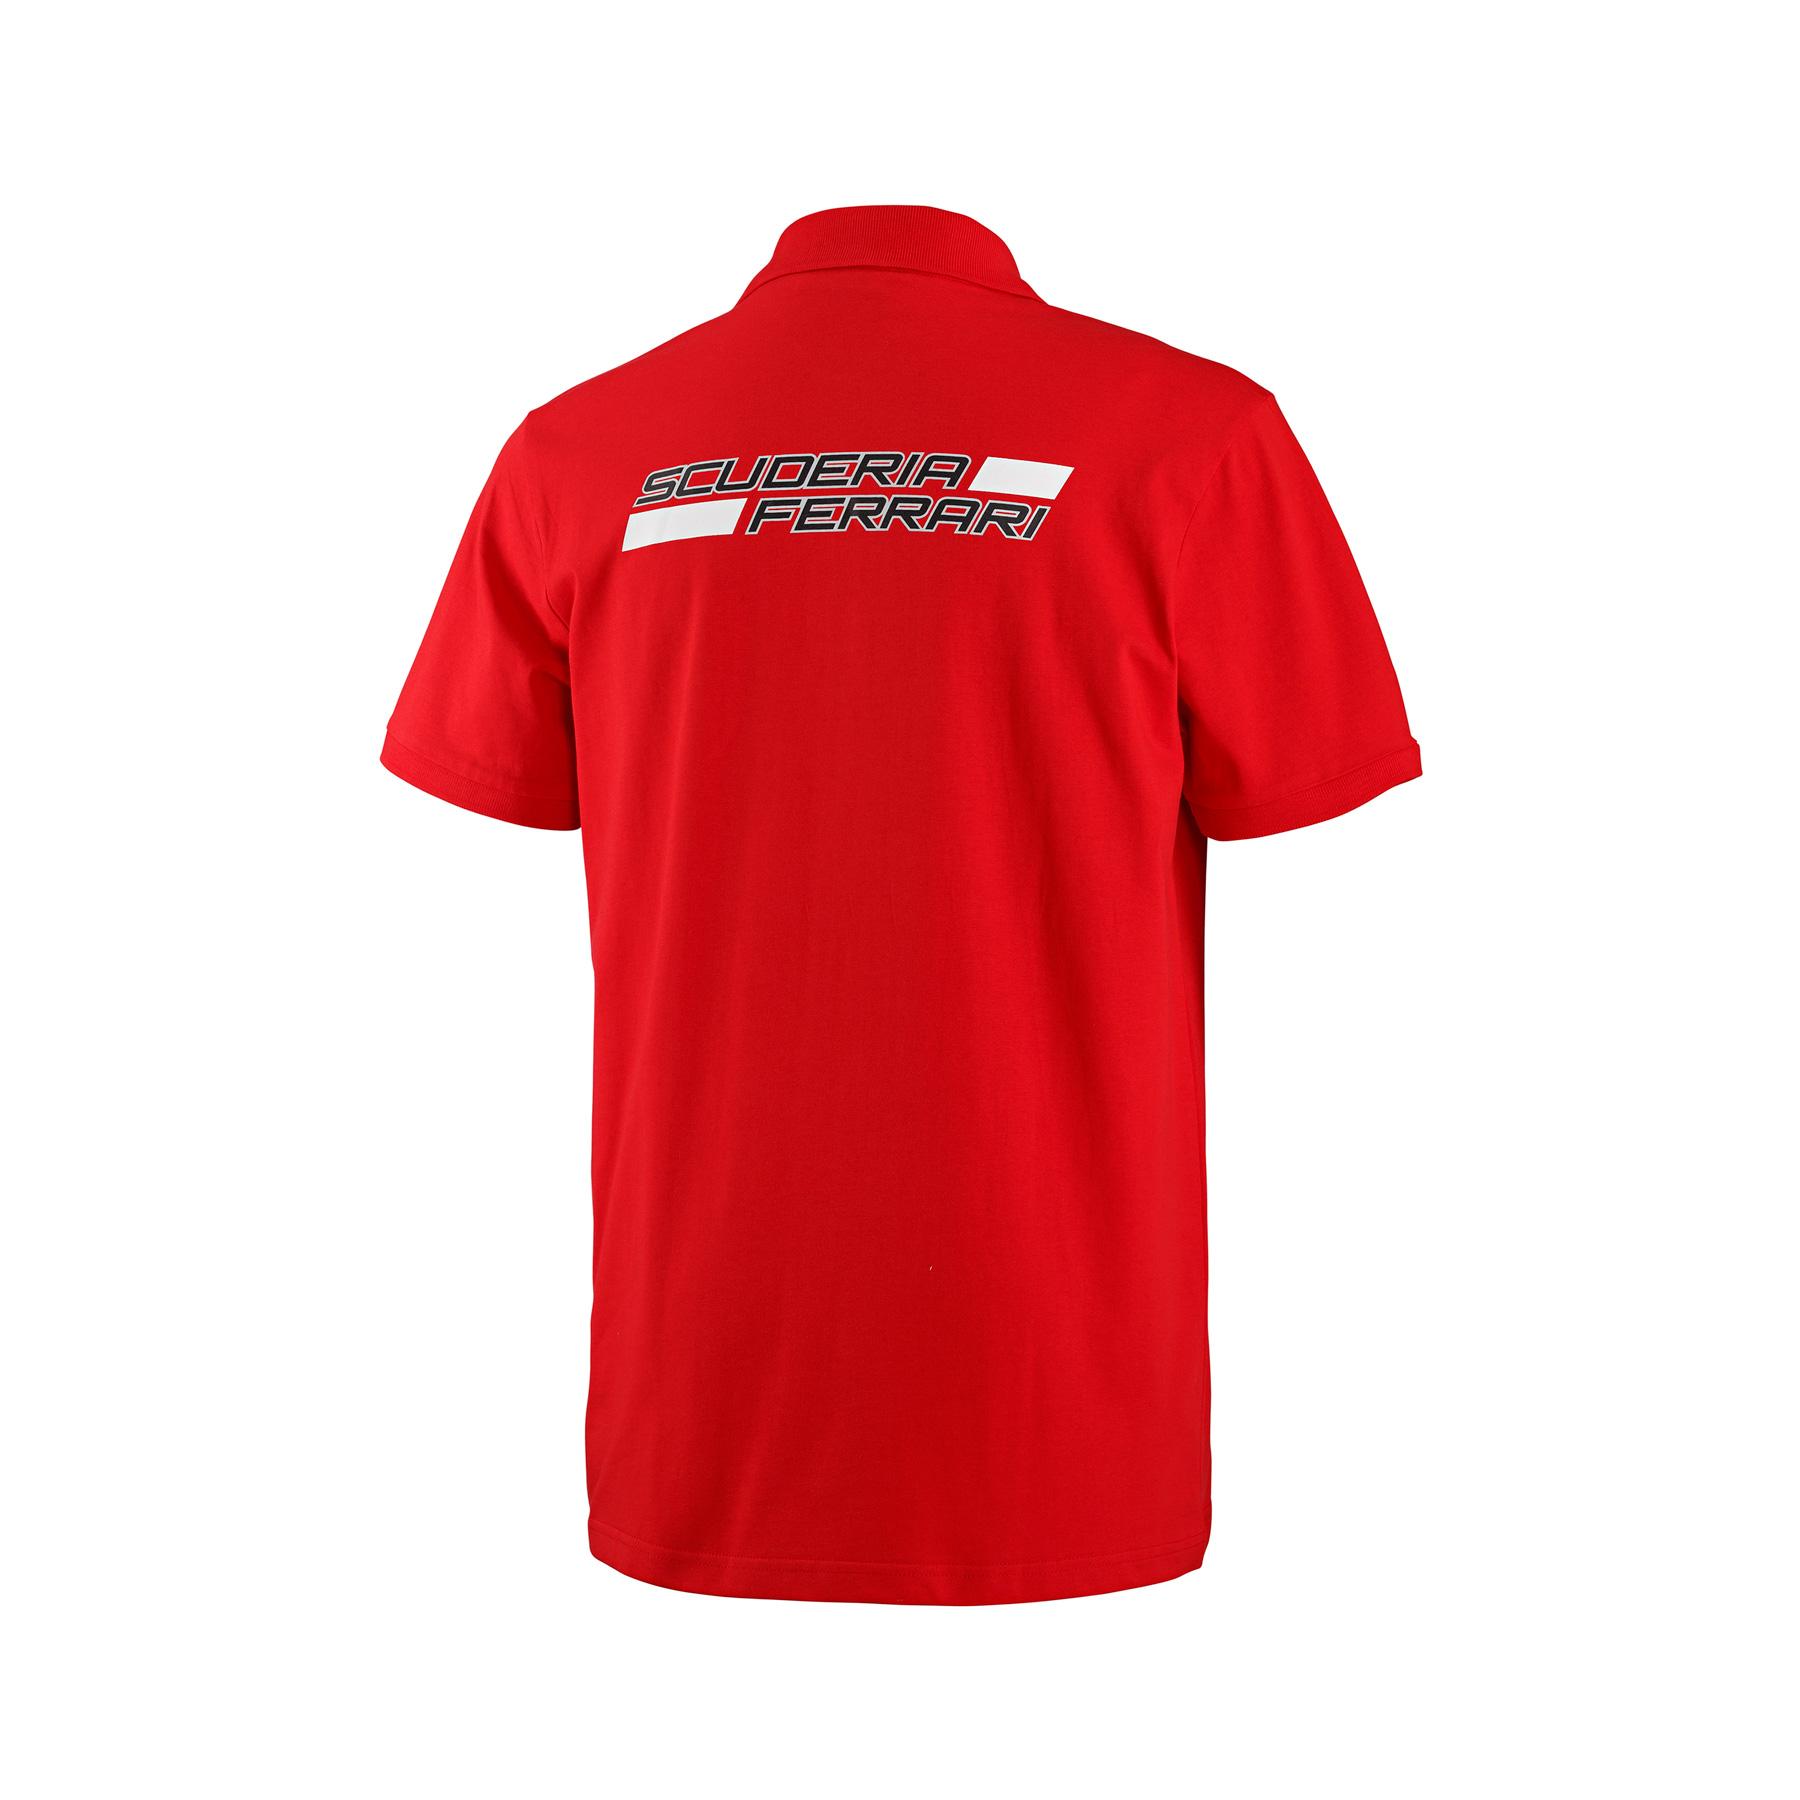 vente ferrari formula 1 team f1 homme rouge scuderia ferrari polo shirt nouveau ebay. Black Bedroom Furniture Sets. Home Design Ideas